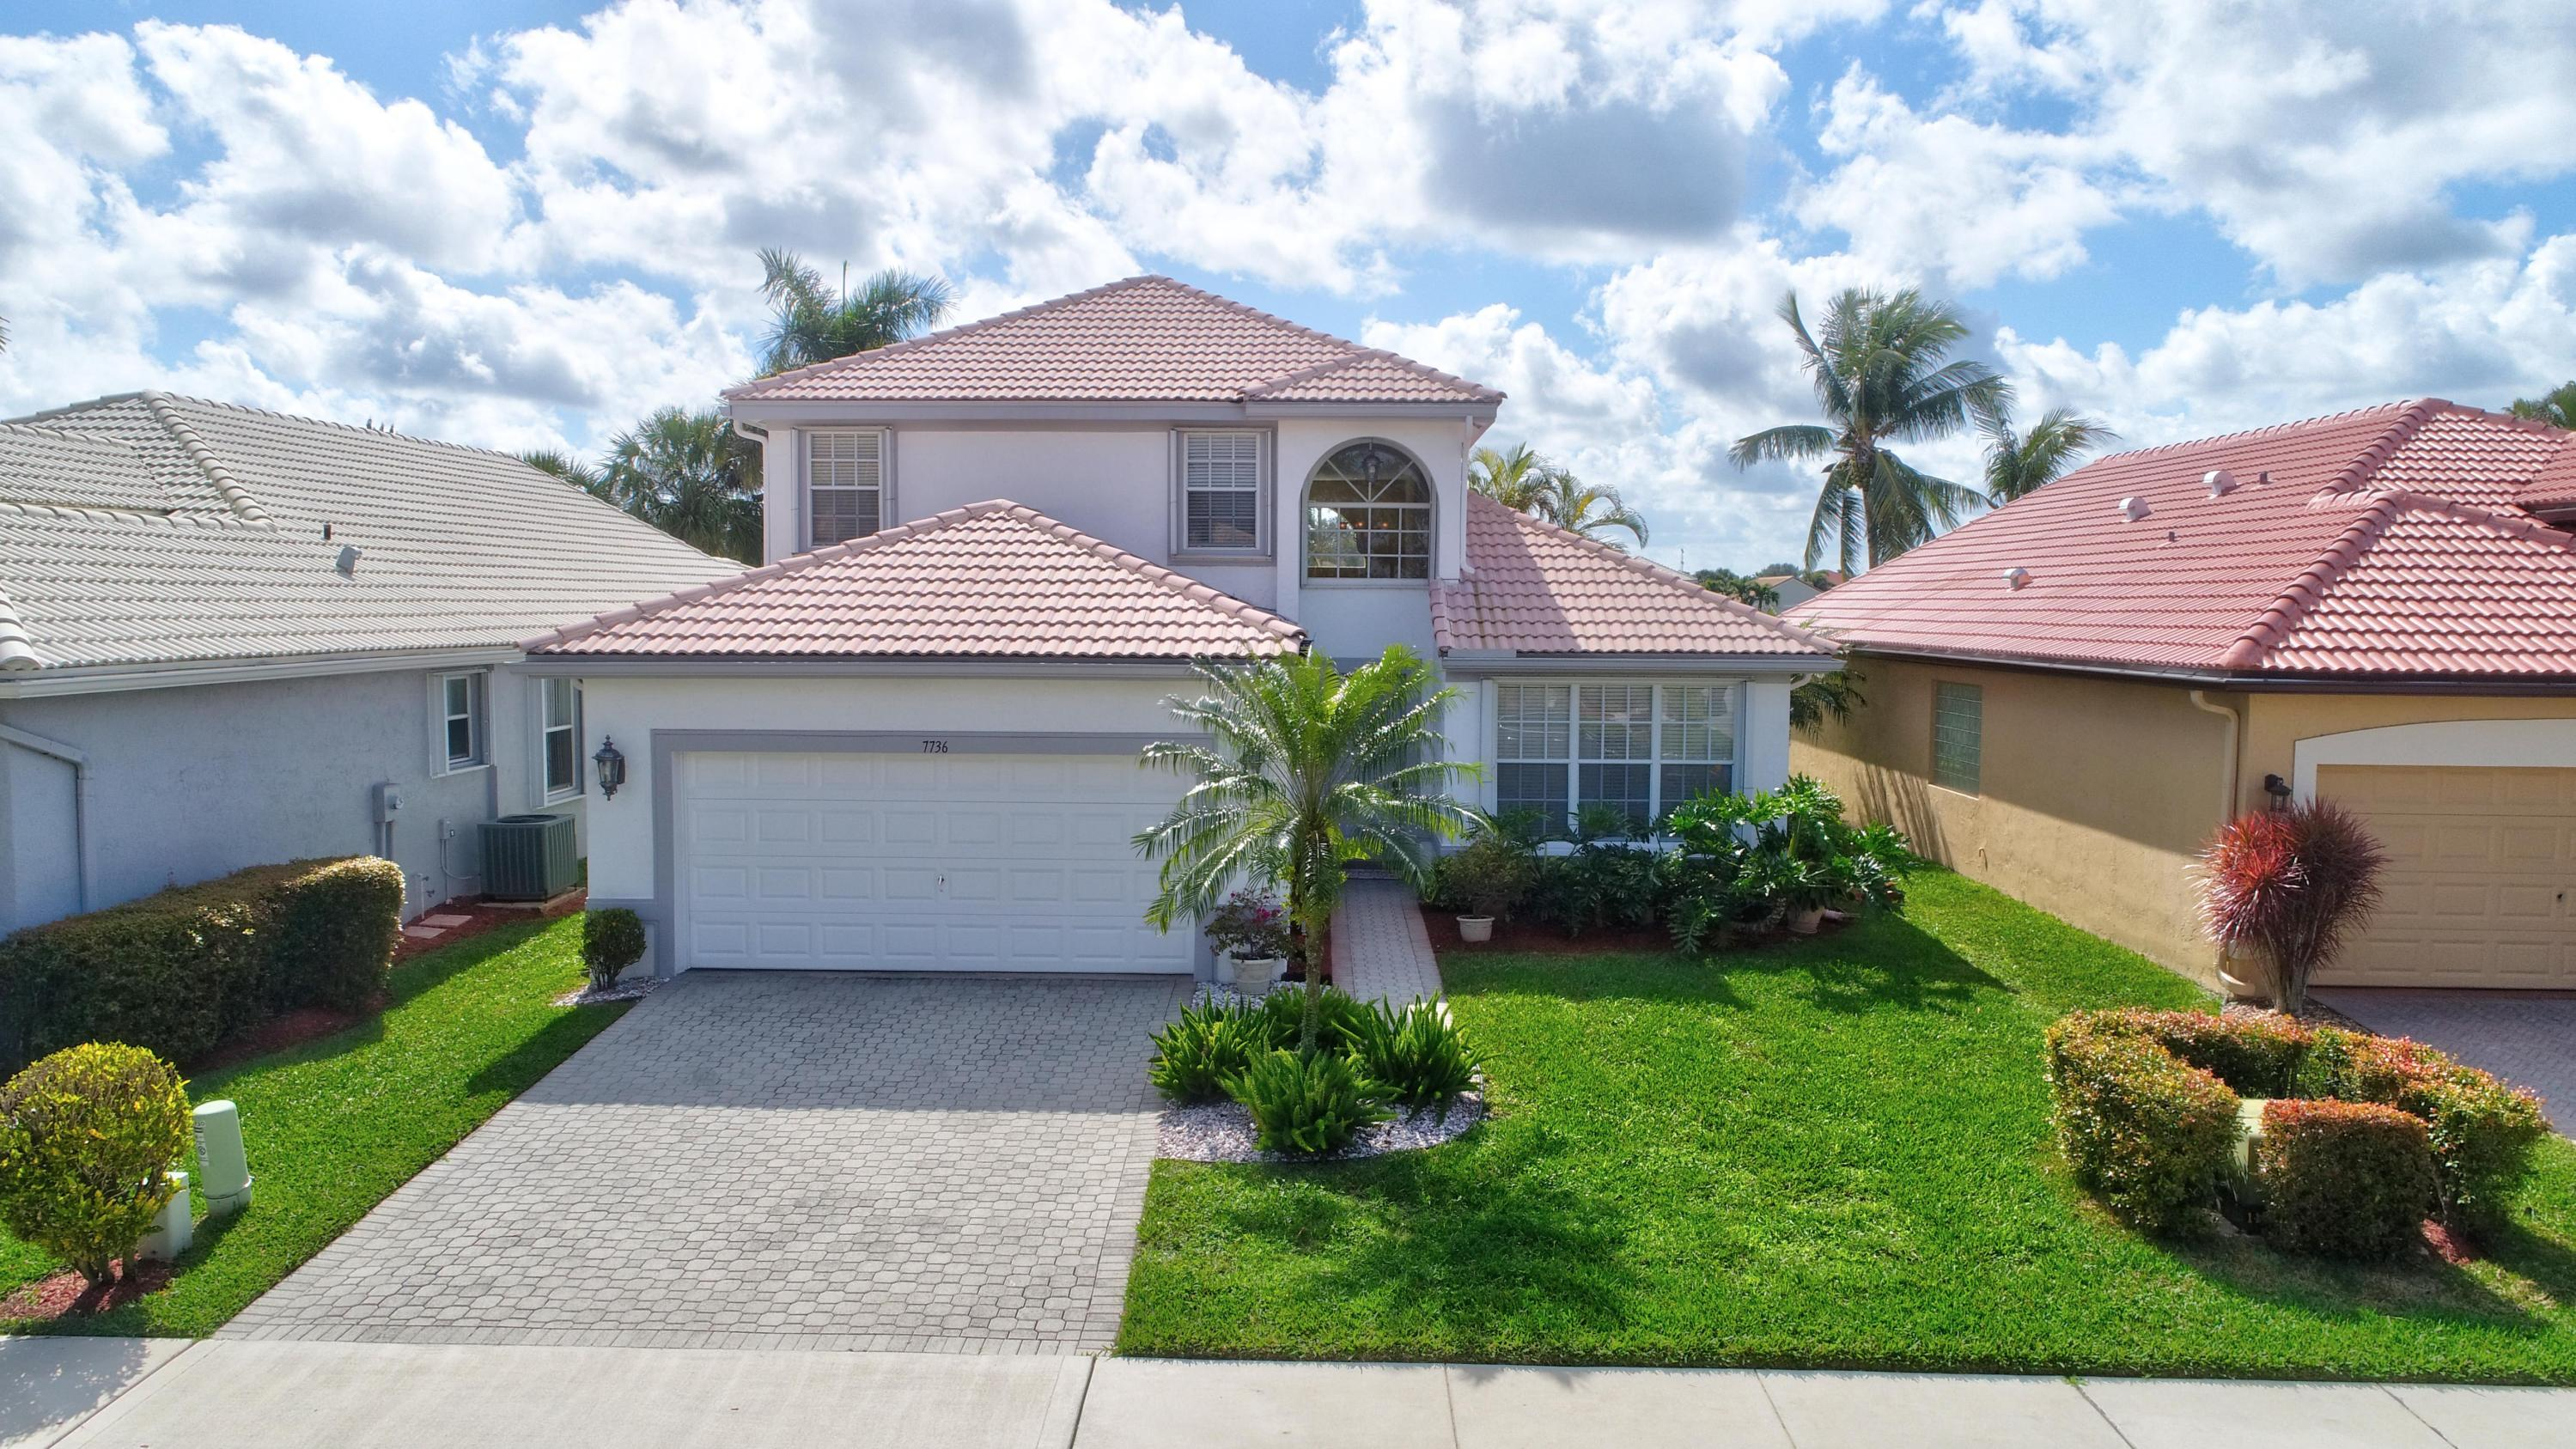 7736 Monarch Court  Delray Beach, FL 33446